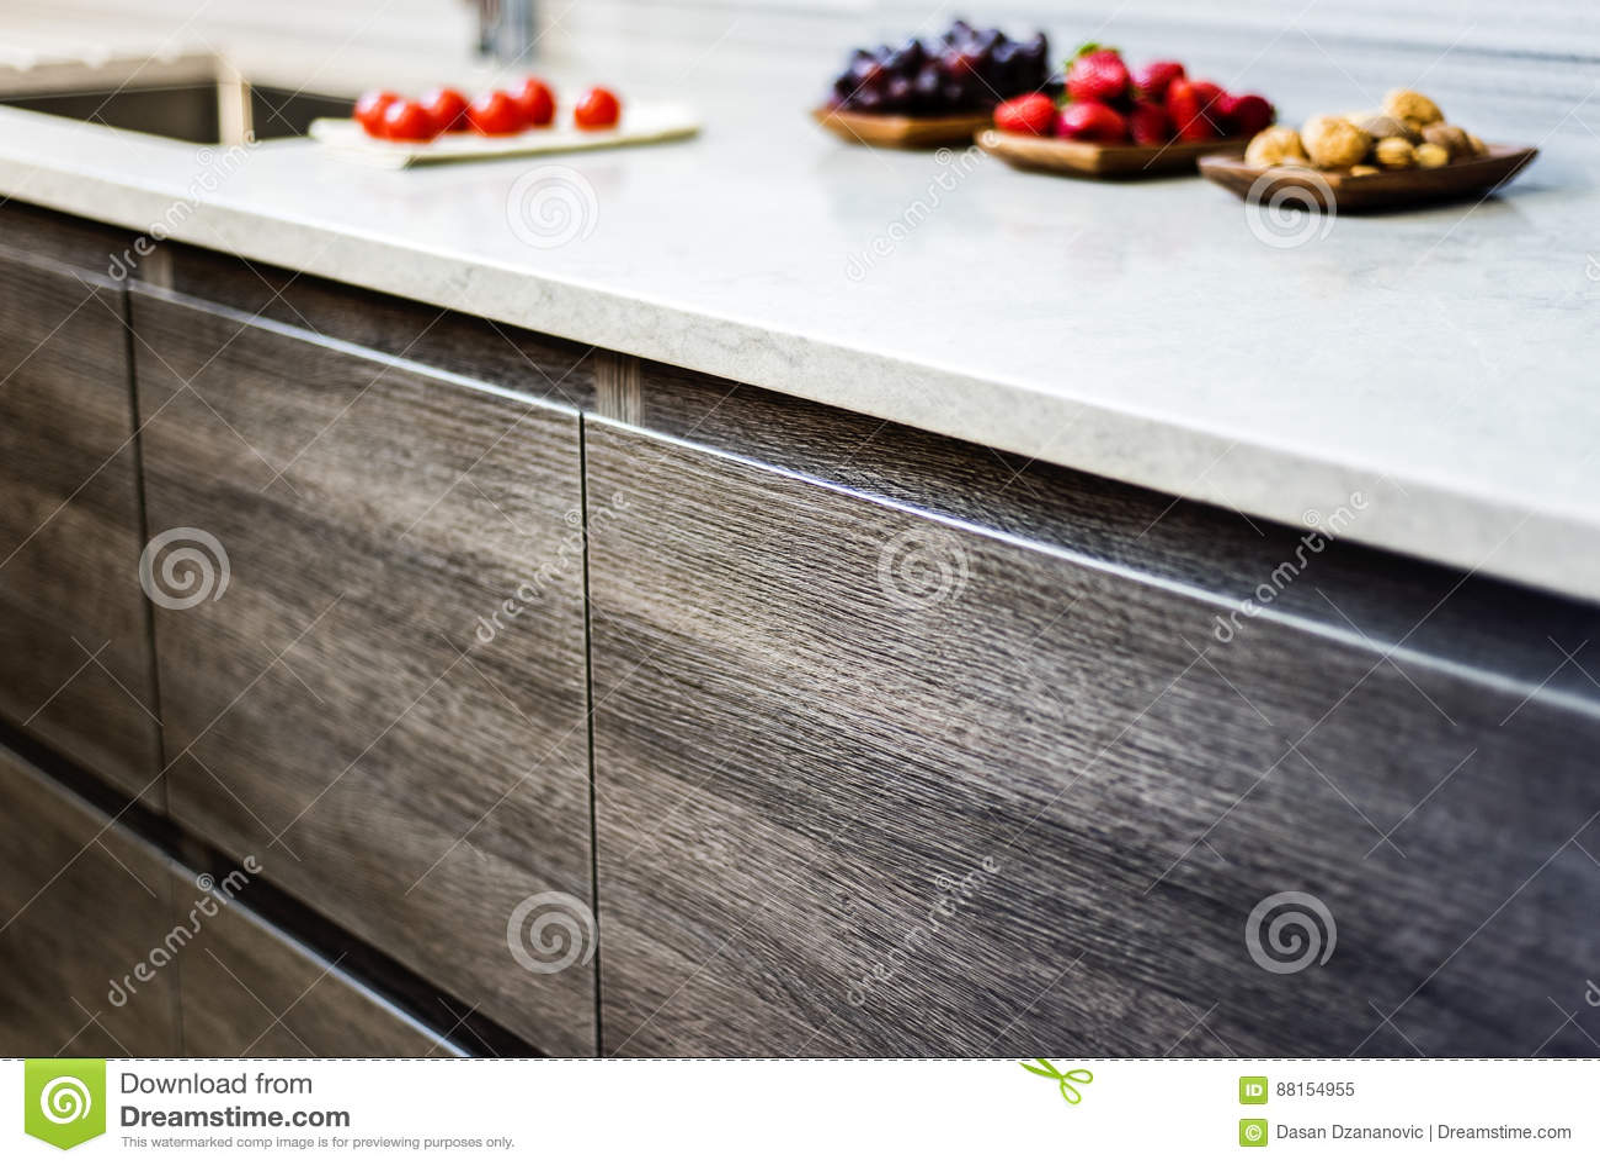 Modern Kitchen Base Cabinets Stock Image Image Of Renovated